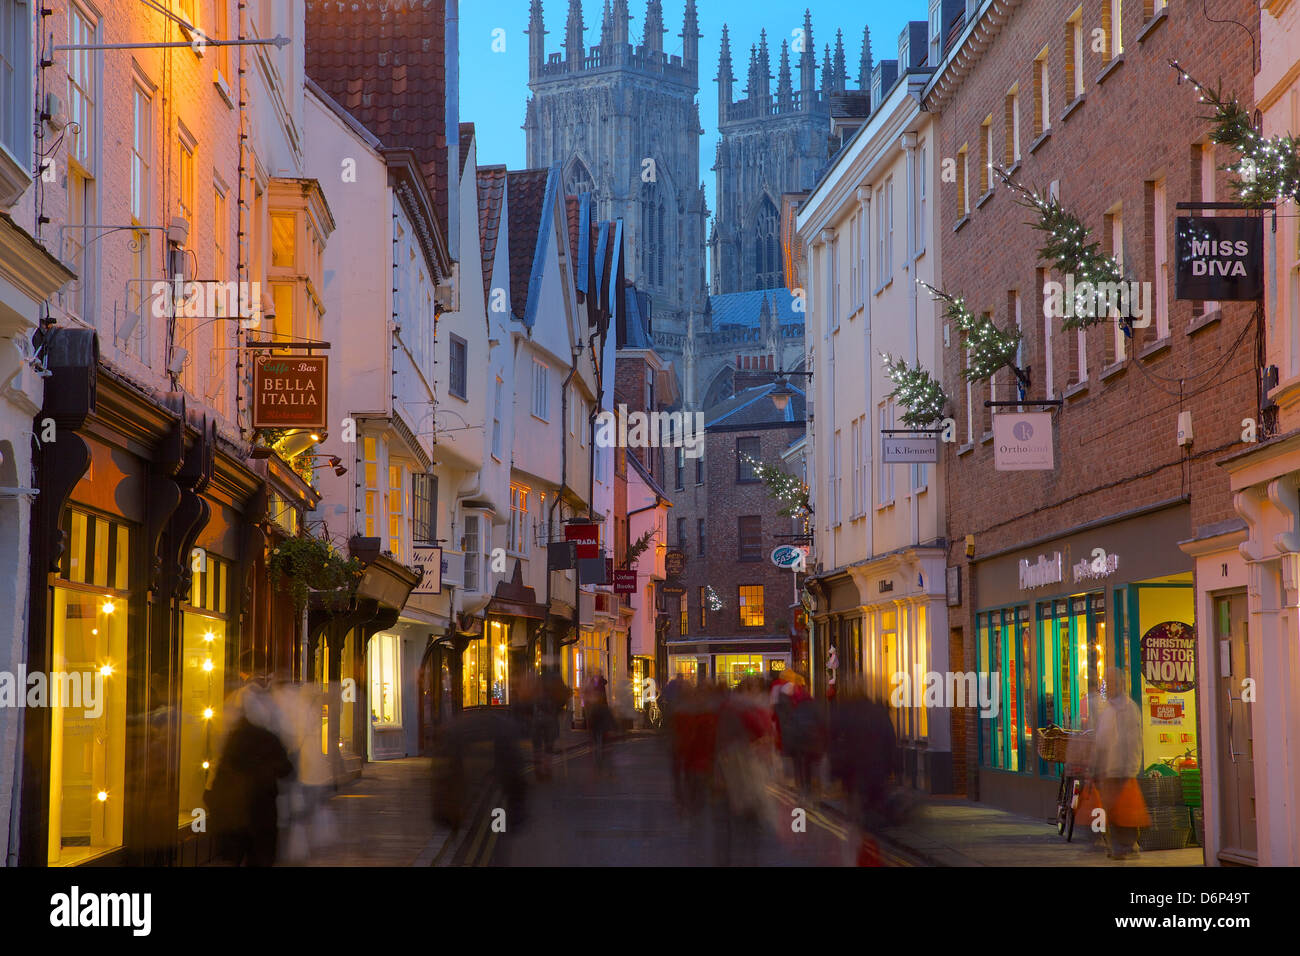 Colliergate y York Minster en Navidad, York, Yorkshire, Inglaterra, Reino Unido, Europa Imagen De Stock